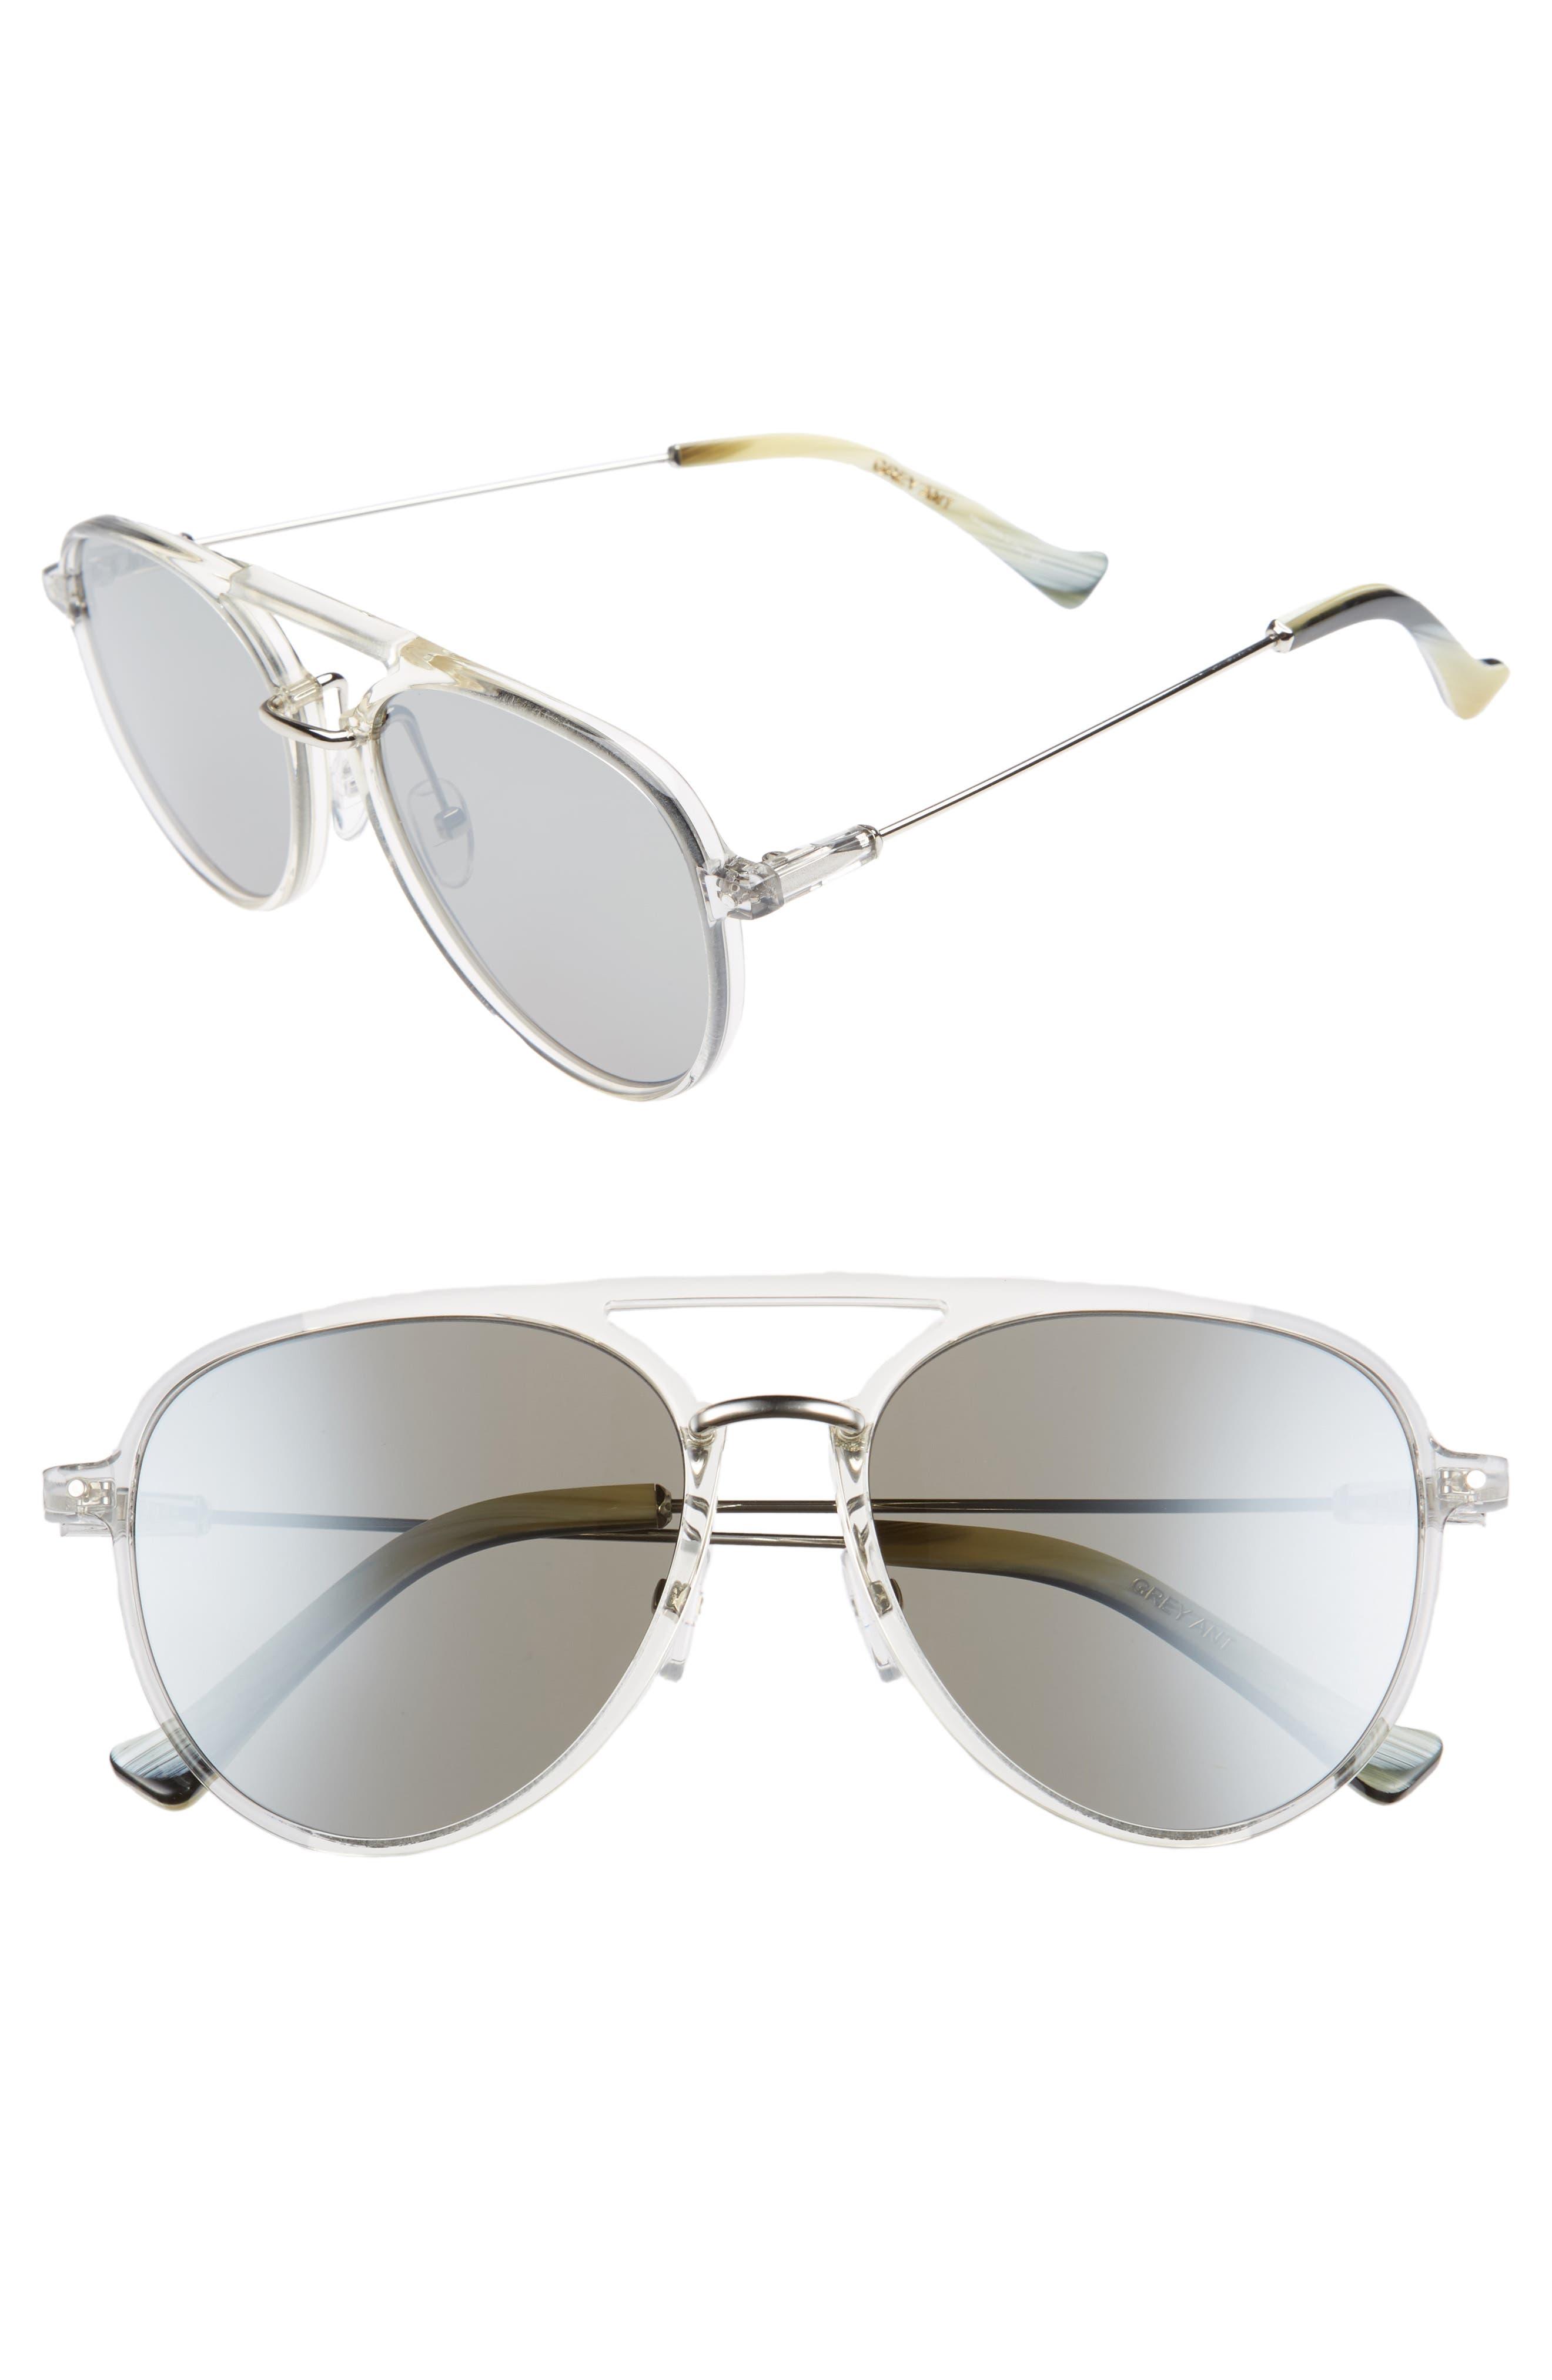 Praph 57mm Sunglasses,                             Main thumbnail 1, color,                             SILVER LENS/ CLEAR HARDWARE